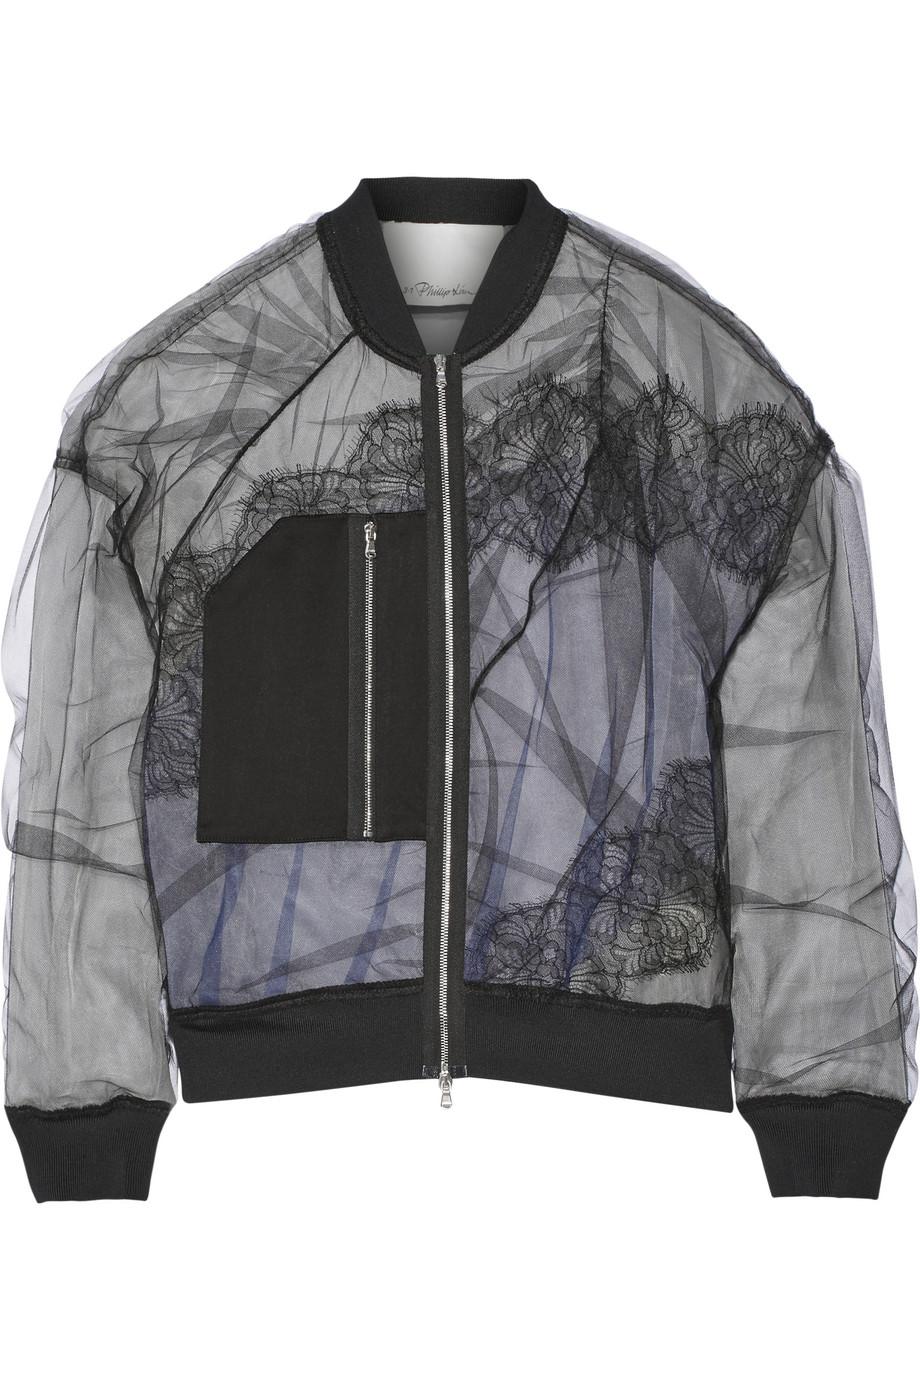 3.1 Phillip Lim Satin and Lace-Paneled Tulle Bomber Jacket, Black, Women's, Size: 2